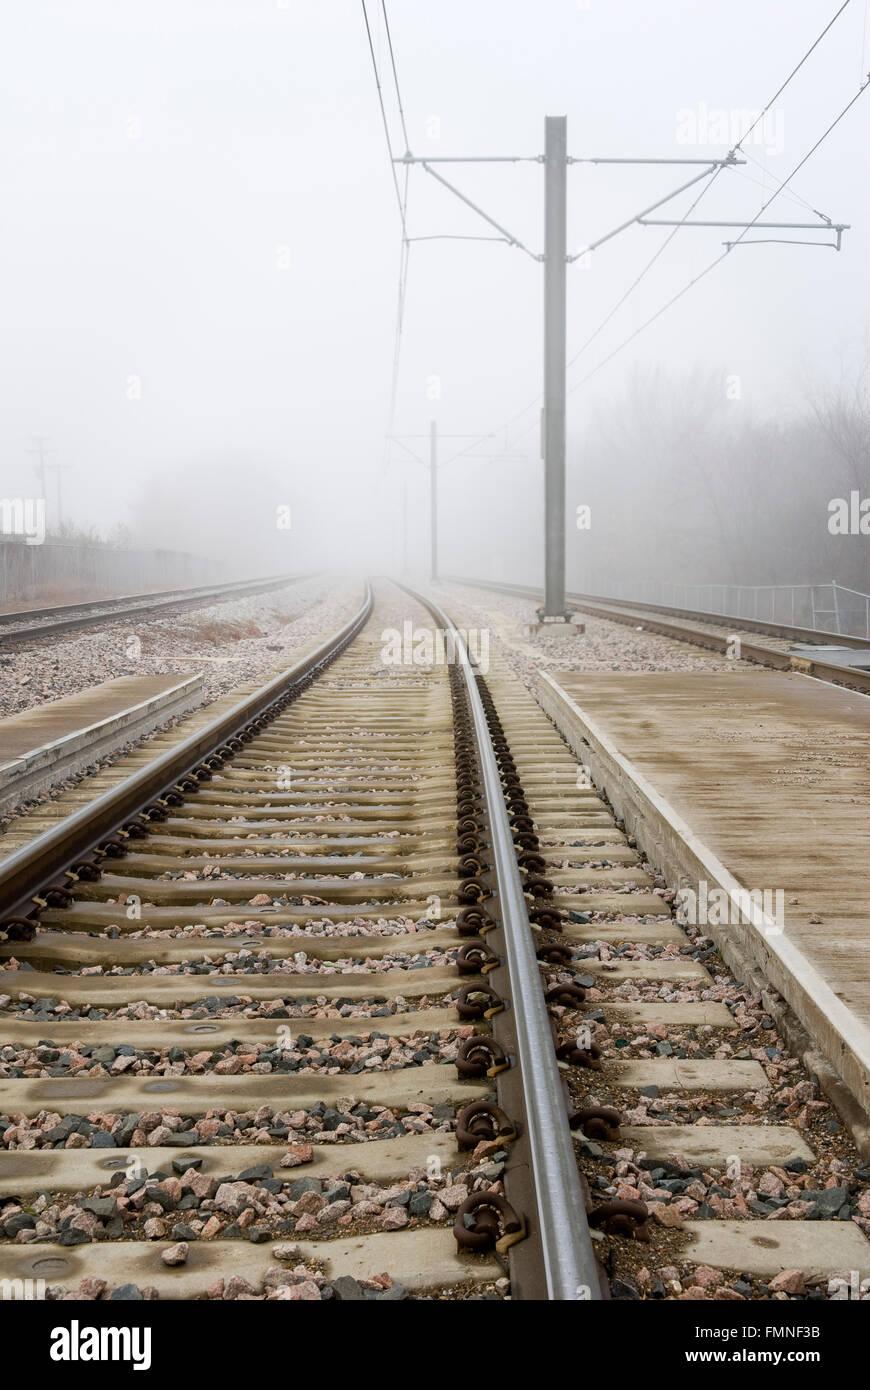 Train Tracks Disappear Into Fog - Stock Image